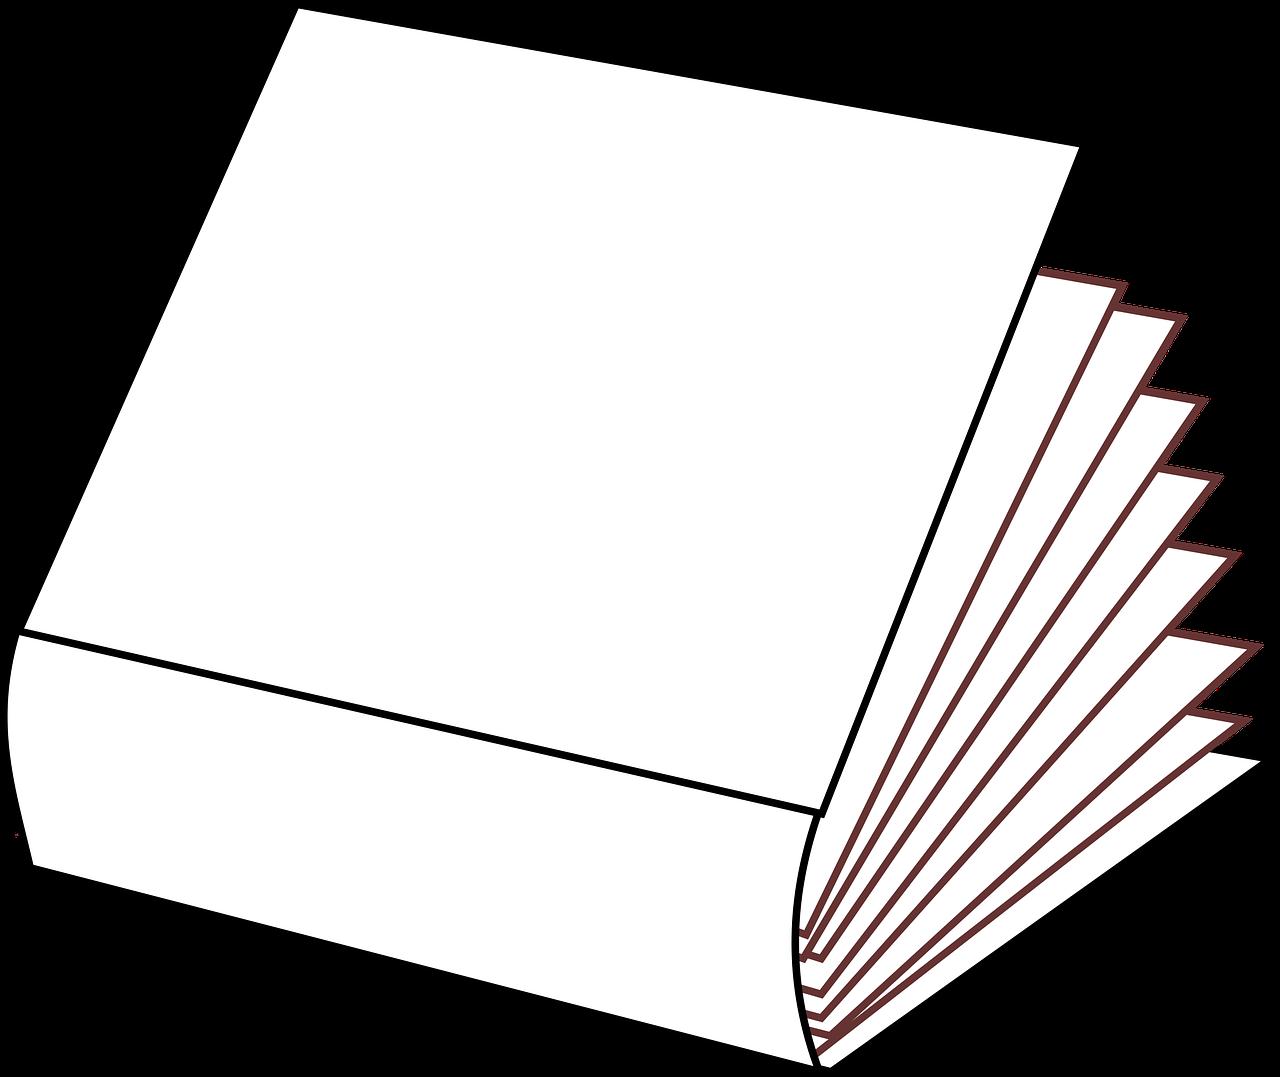 Book Clipart Images, Stock Photos & Vectors   Shutterstock